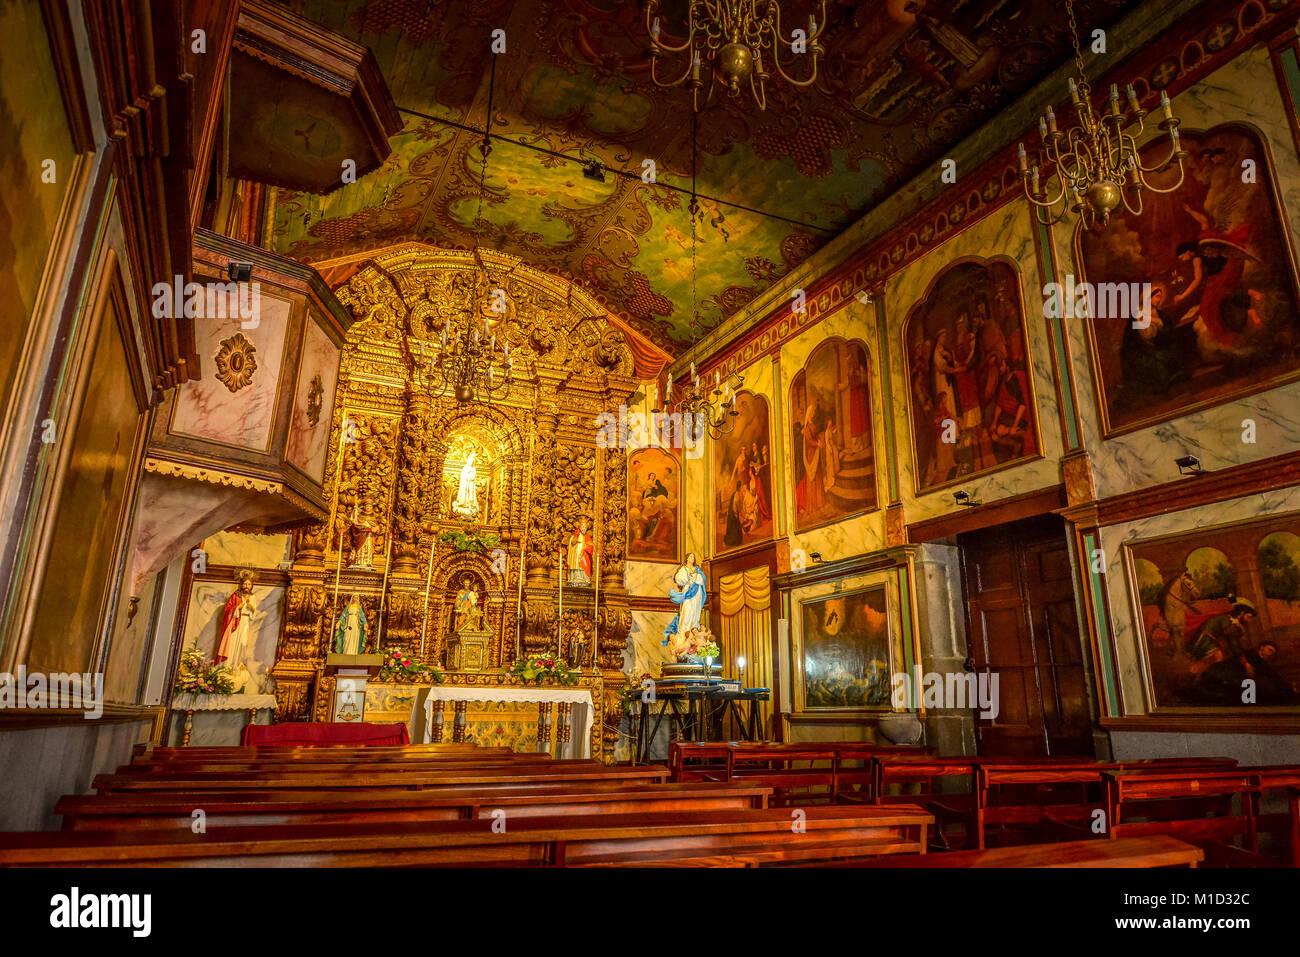 'Igreja Sao Sebastiao Church', Camara de Lobos, Madeira, Portugal, Kirche ´Igreja Sao Sebastiao´,  Camara de Lobos Stock Photo